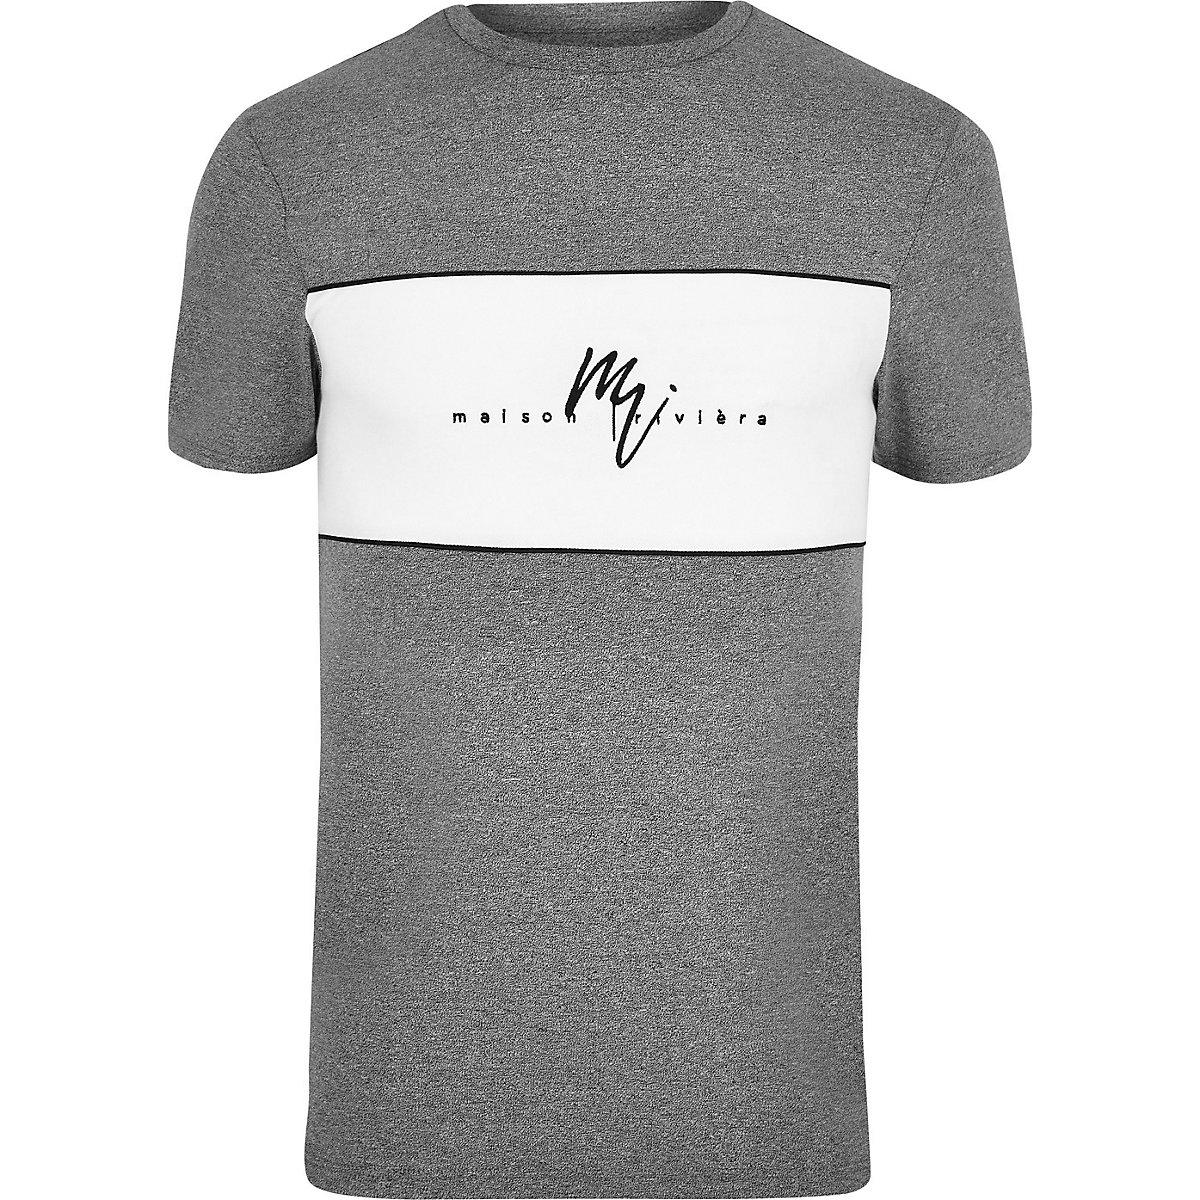 Big and Tall grey 'Maison Riviera' T-shirt